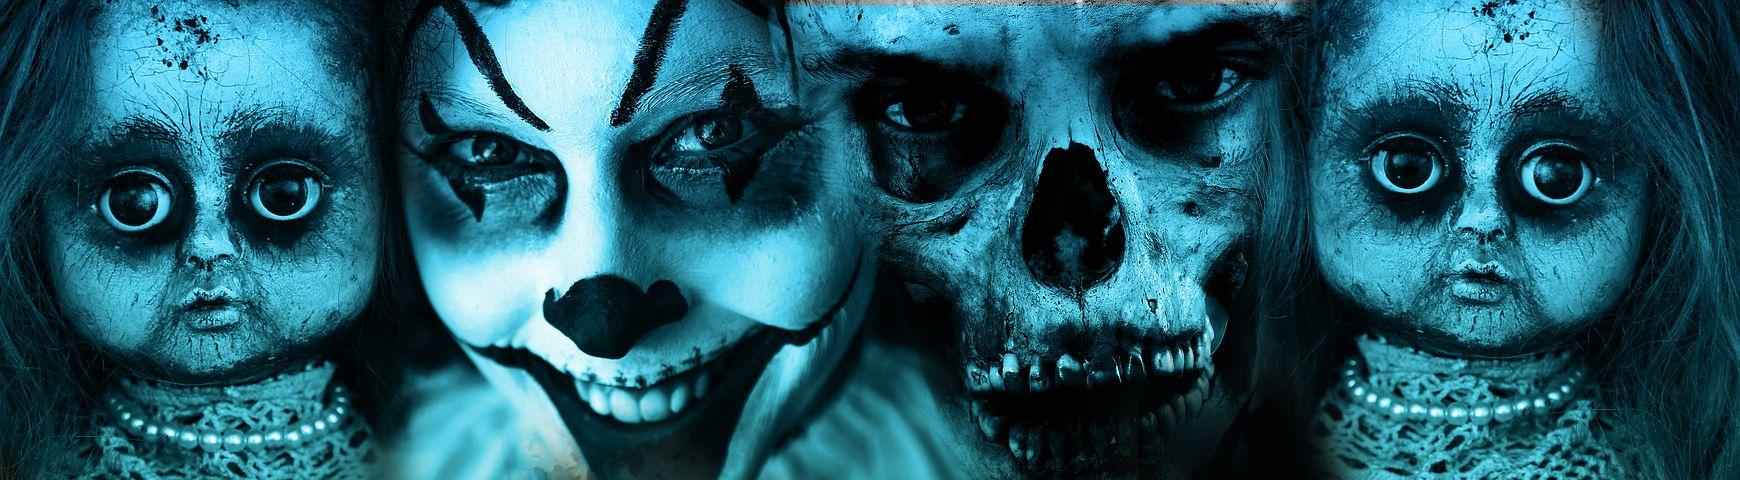 horror-video-clown-manor.jpg